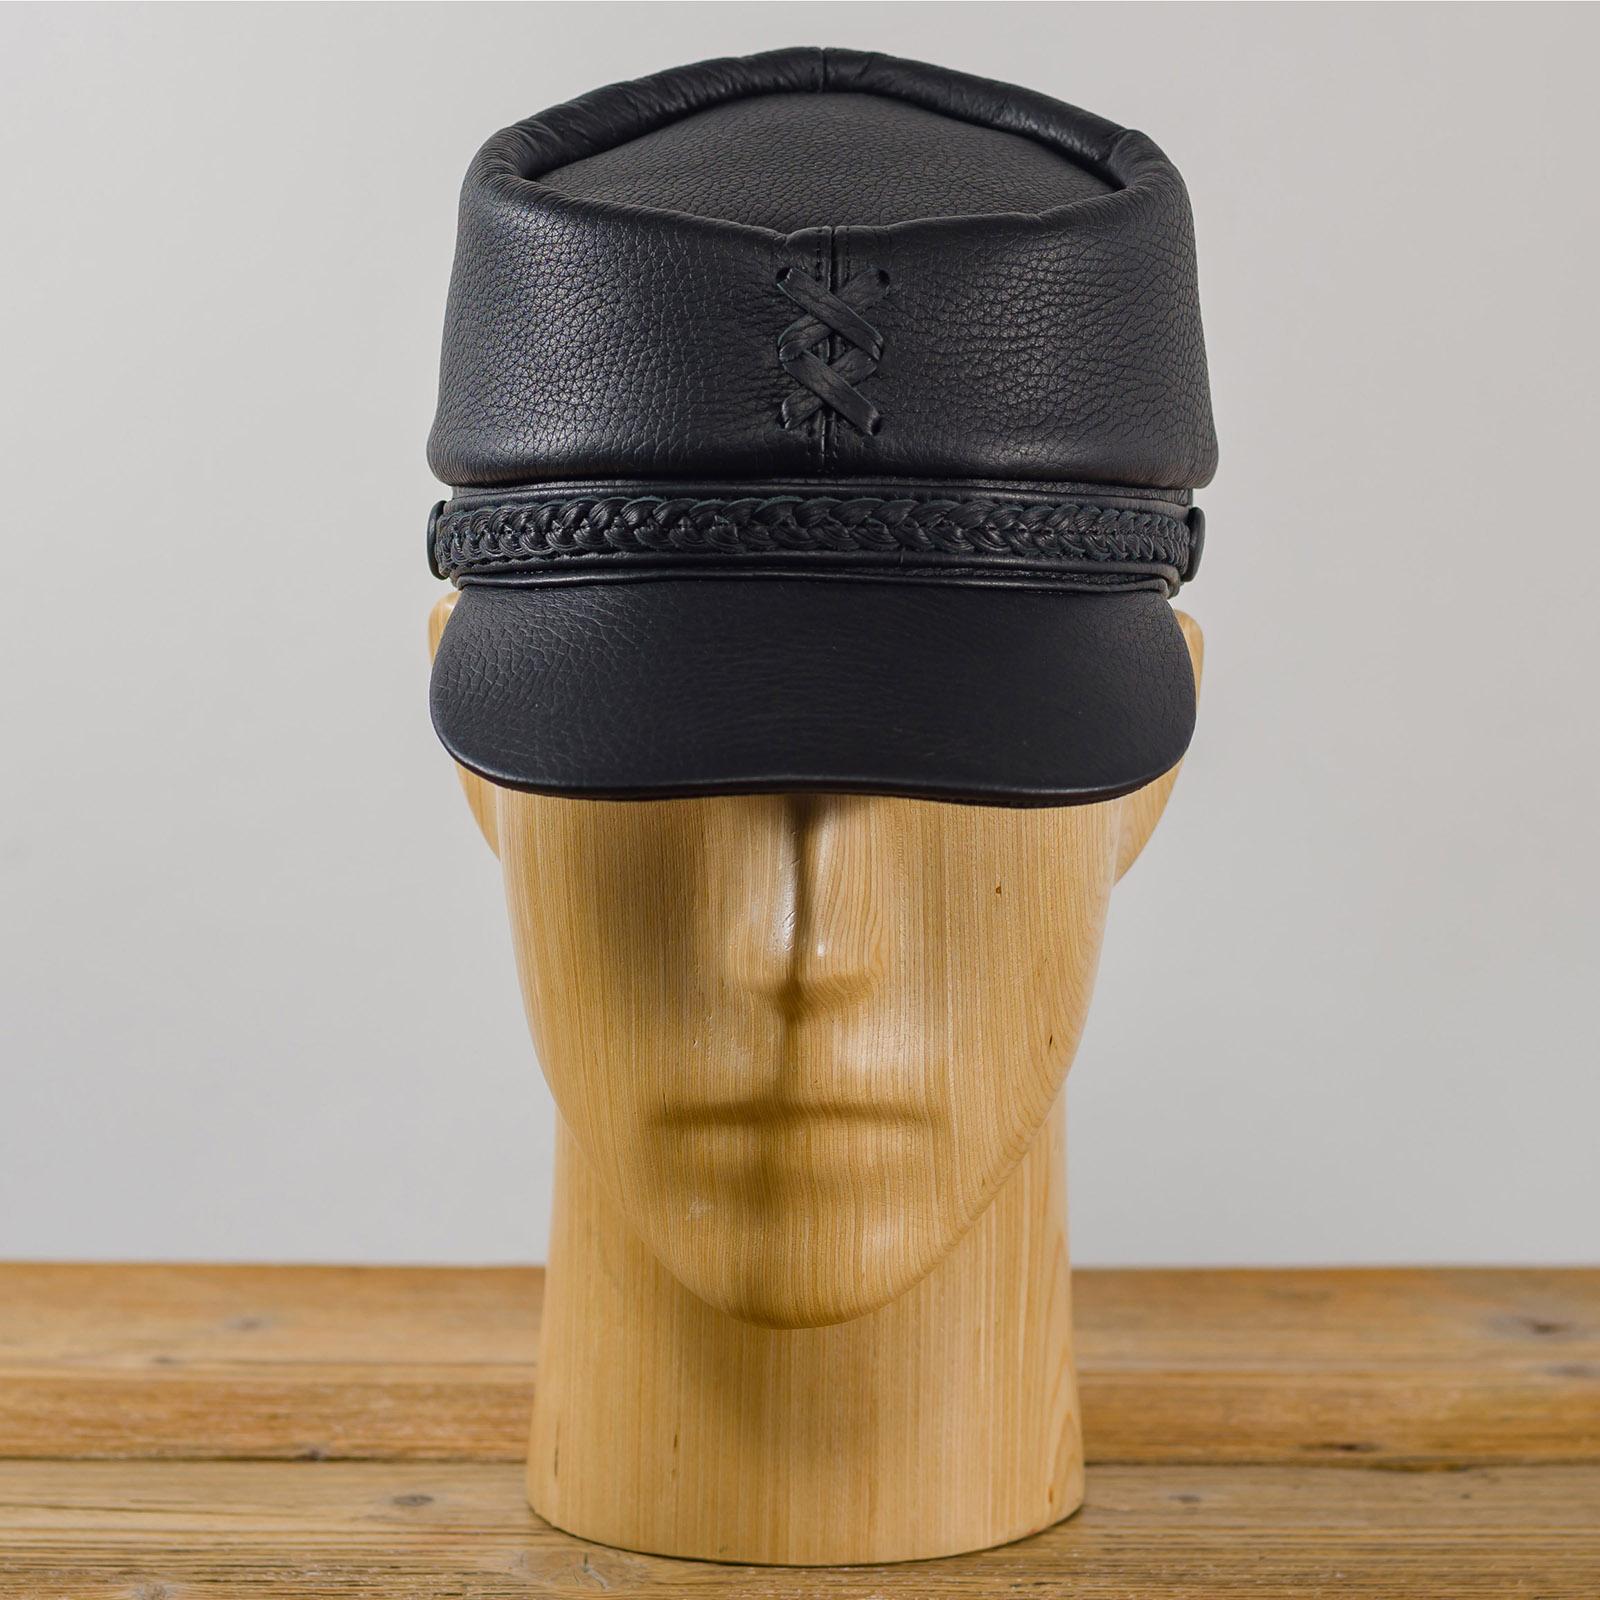 Patriot - Mütze Männer replik Kappi mit schirm, schwarz ledermütze